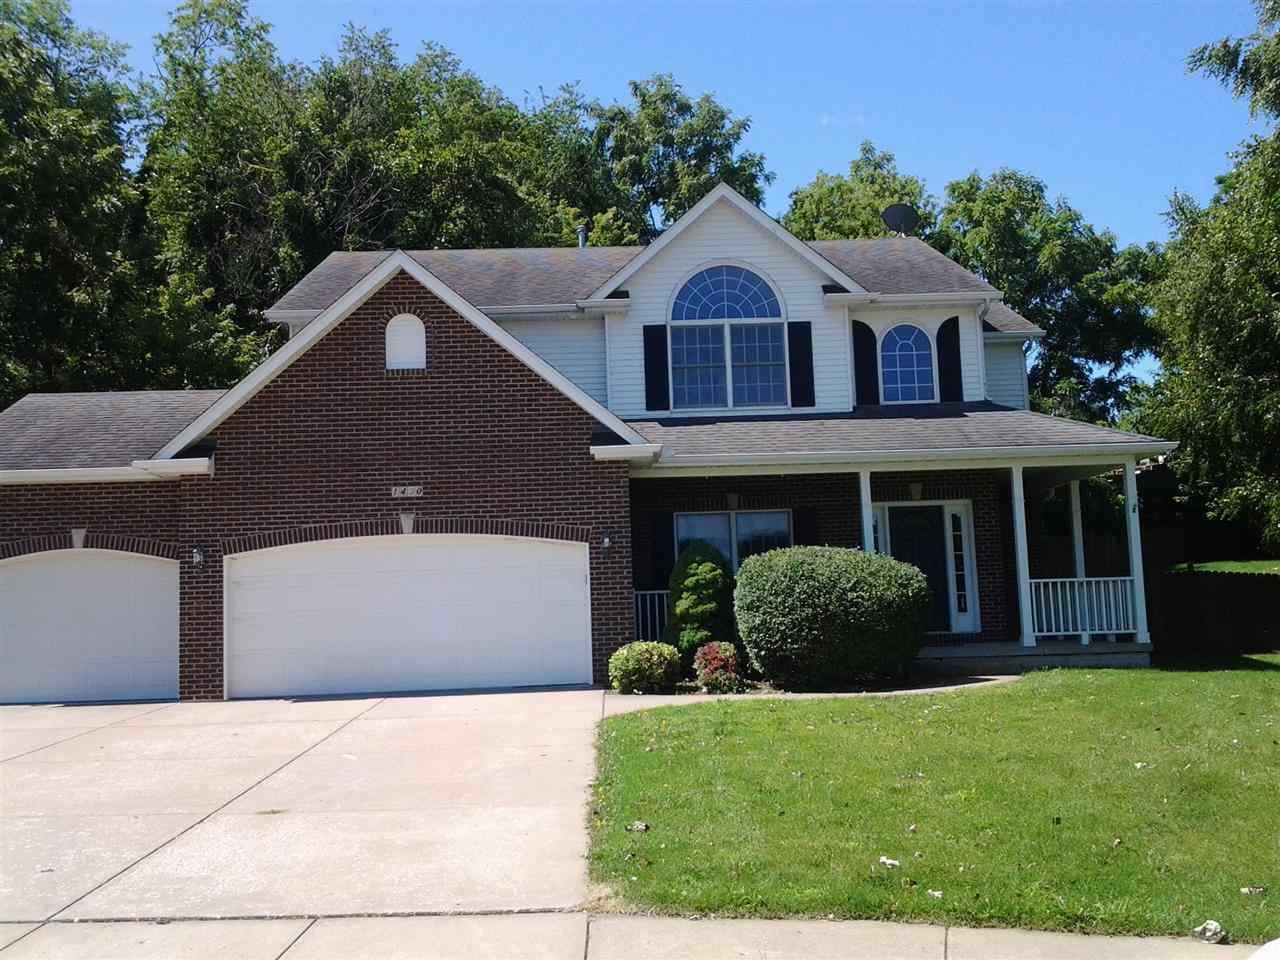 Real Estate for Sale, ListingId: 29082608, Bettendorf,IA52722